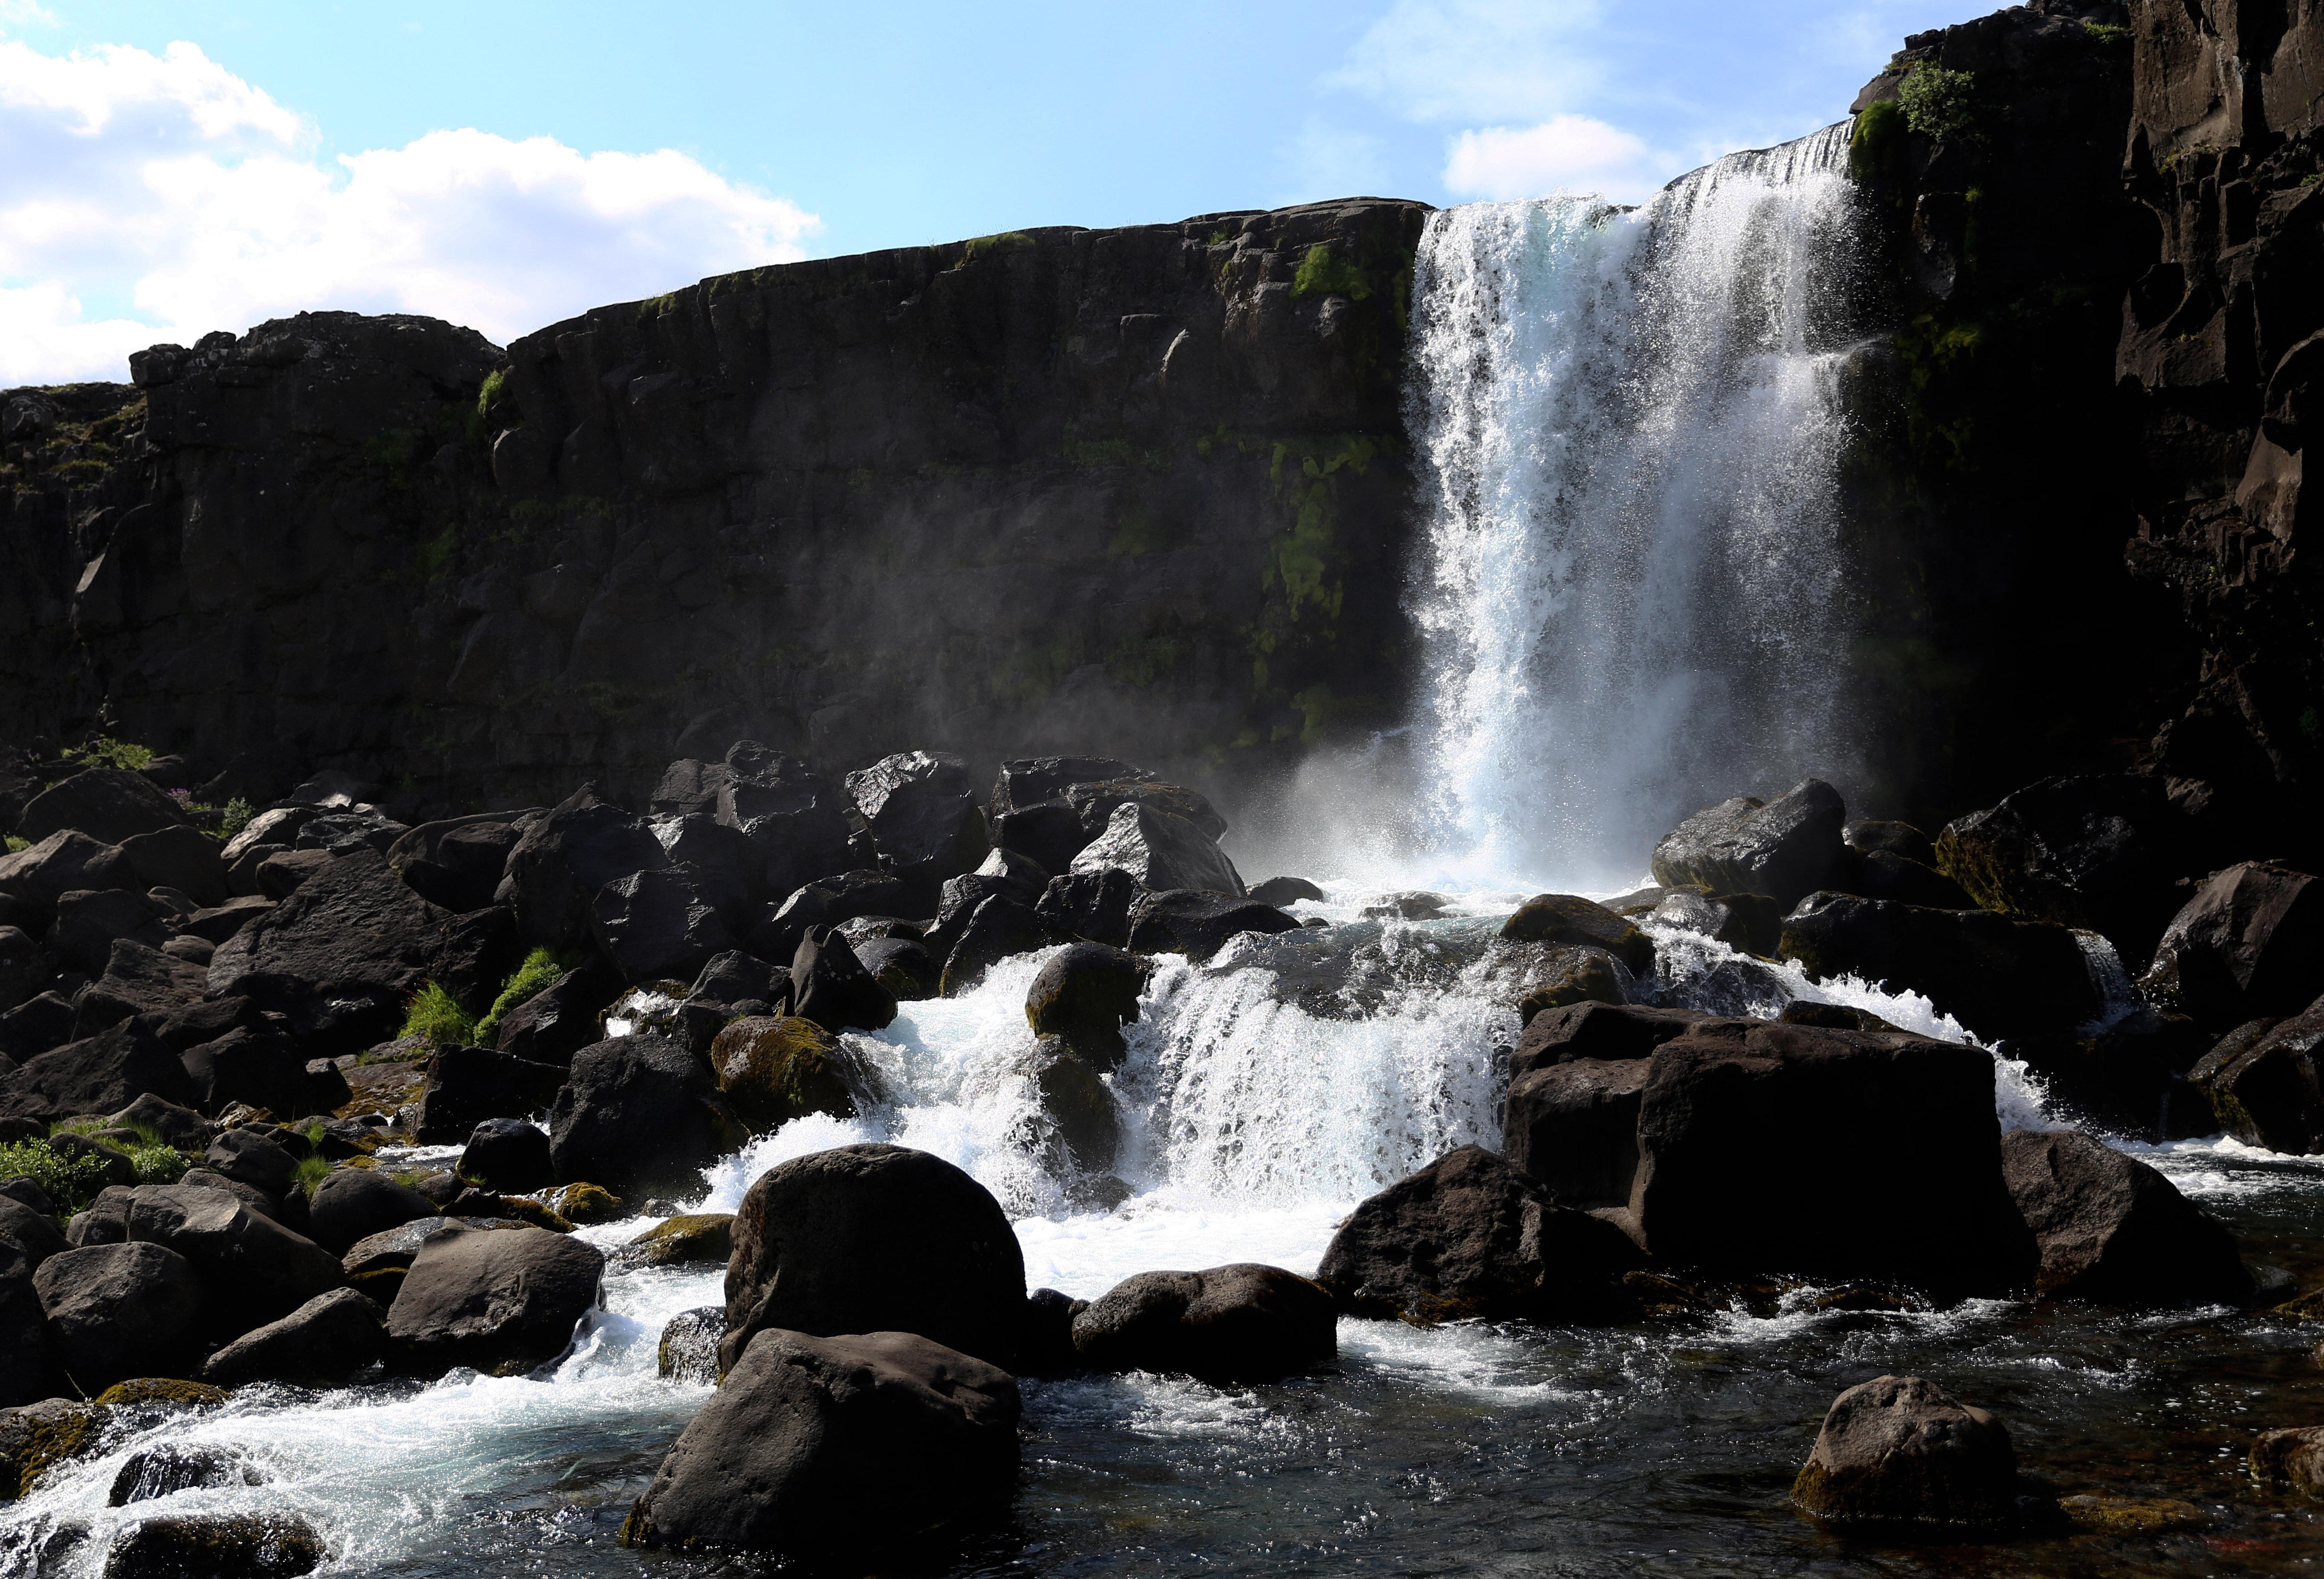 Wasserfall im Þingvellir Nationalpark in Island ©Imke Haverbusch